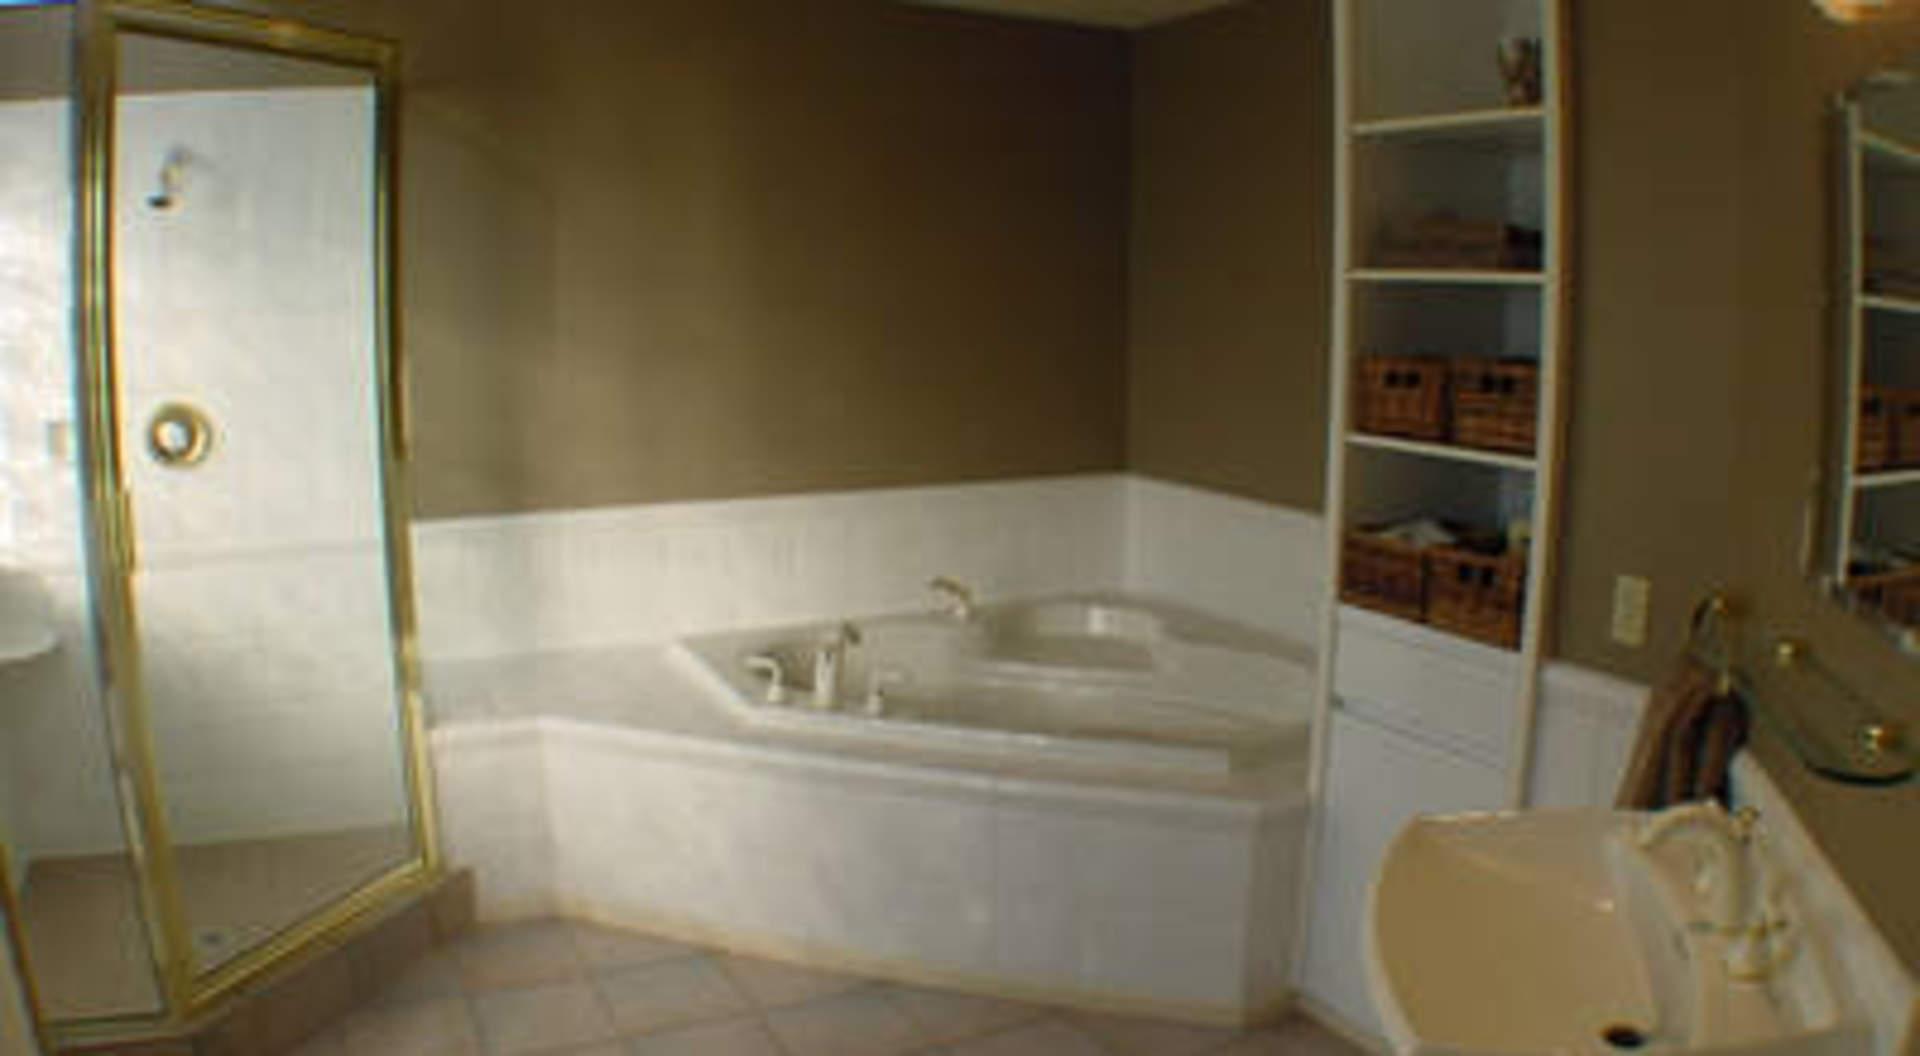 lg kitchen suite aid mixer cover 3320 thompson crescent - 西温哥华住房与地产——加拿大不列颠哥伦比亚省